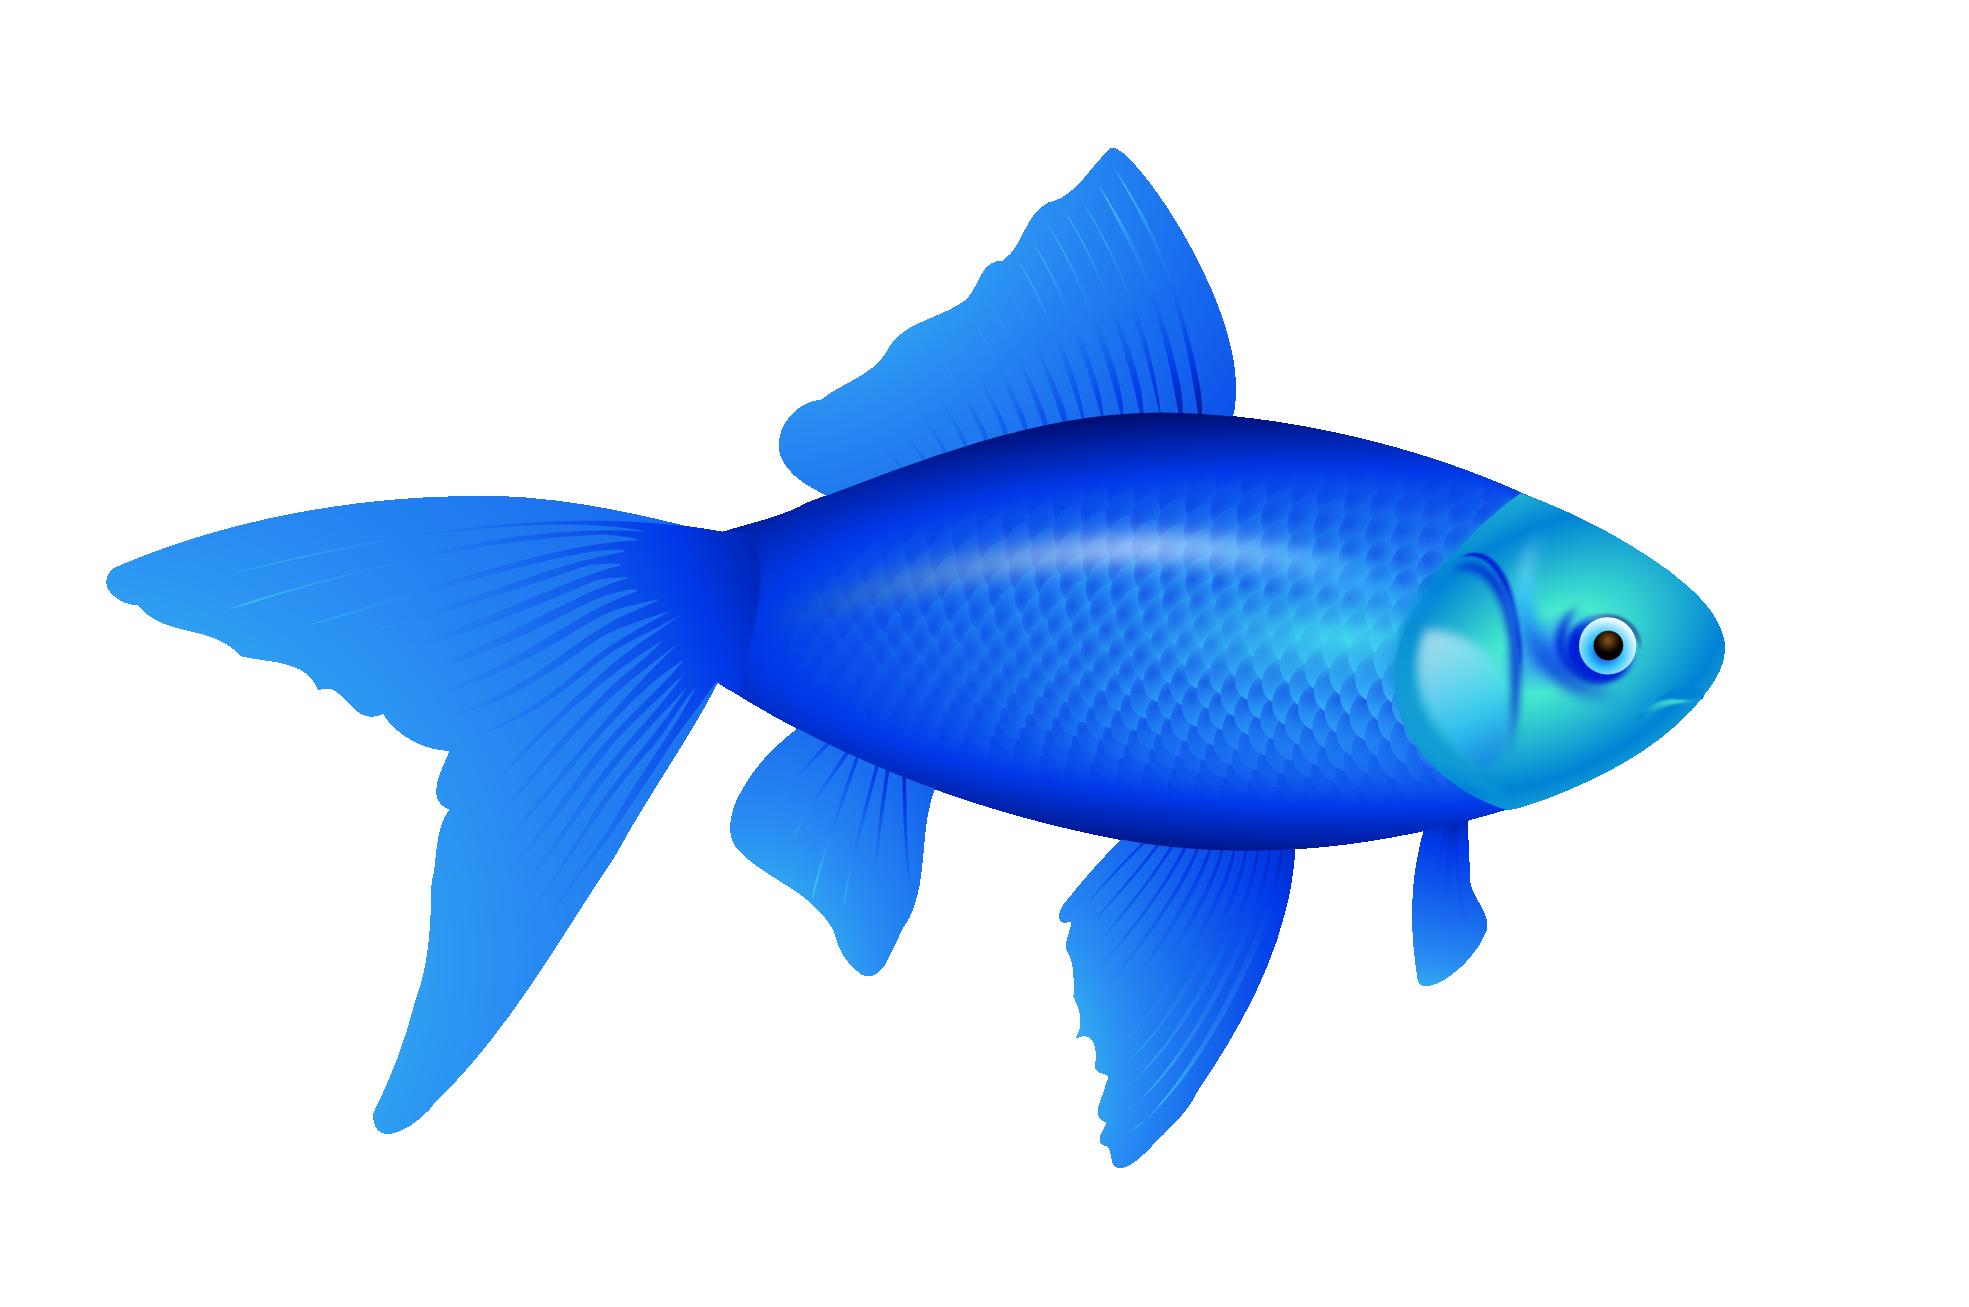 blue-fish-png-image-18